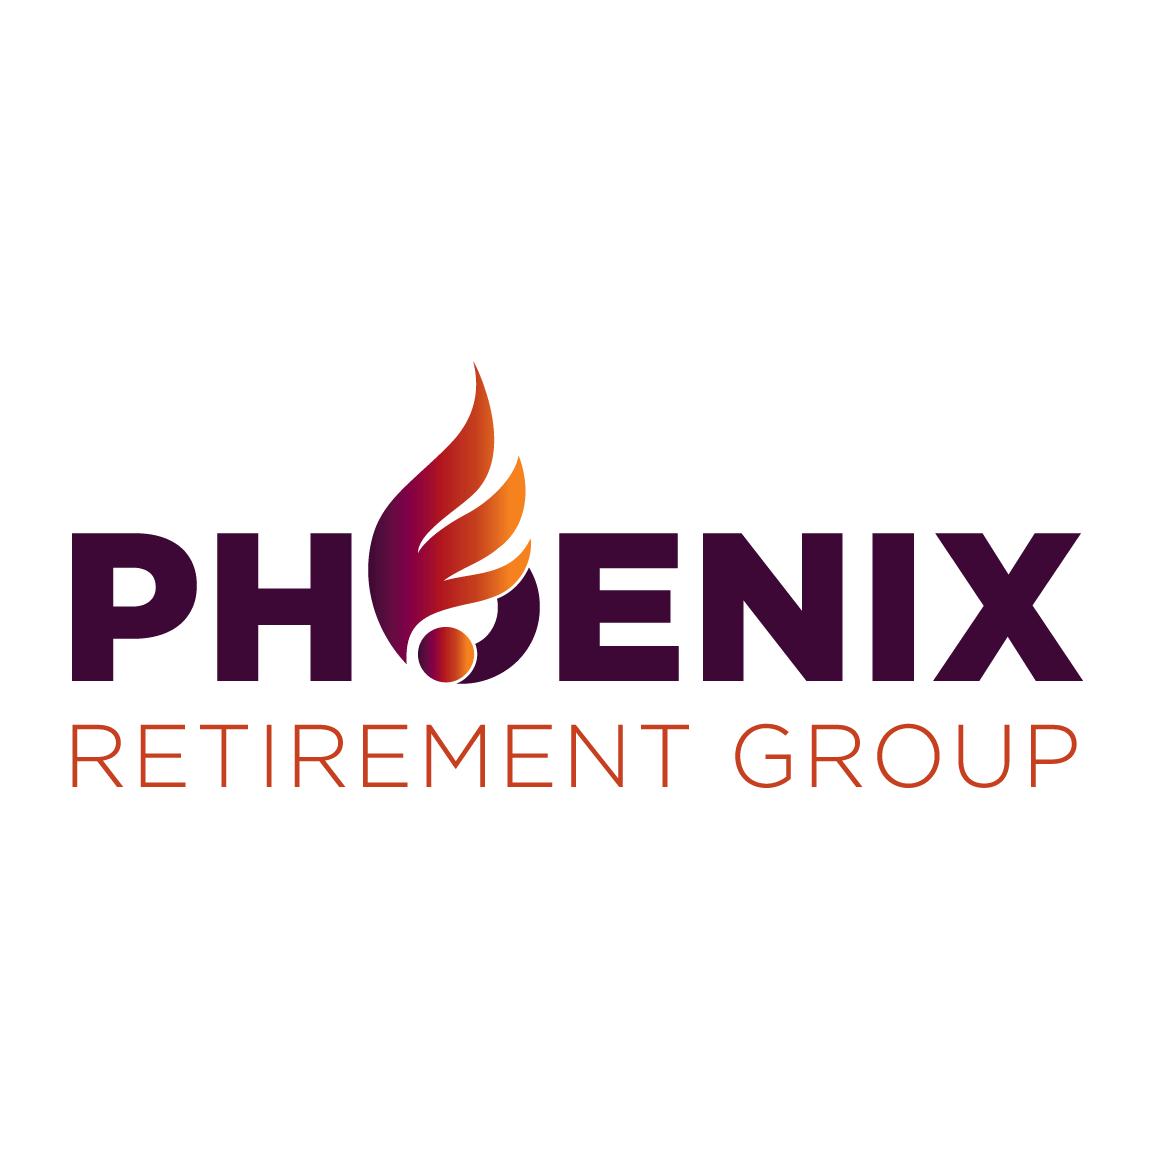 Phoenix Retirement Group